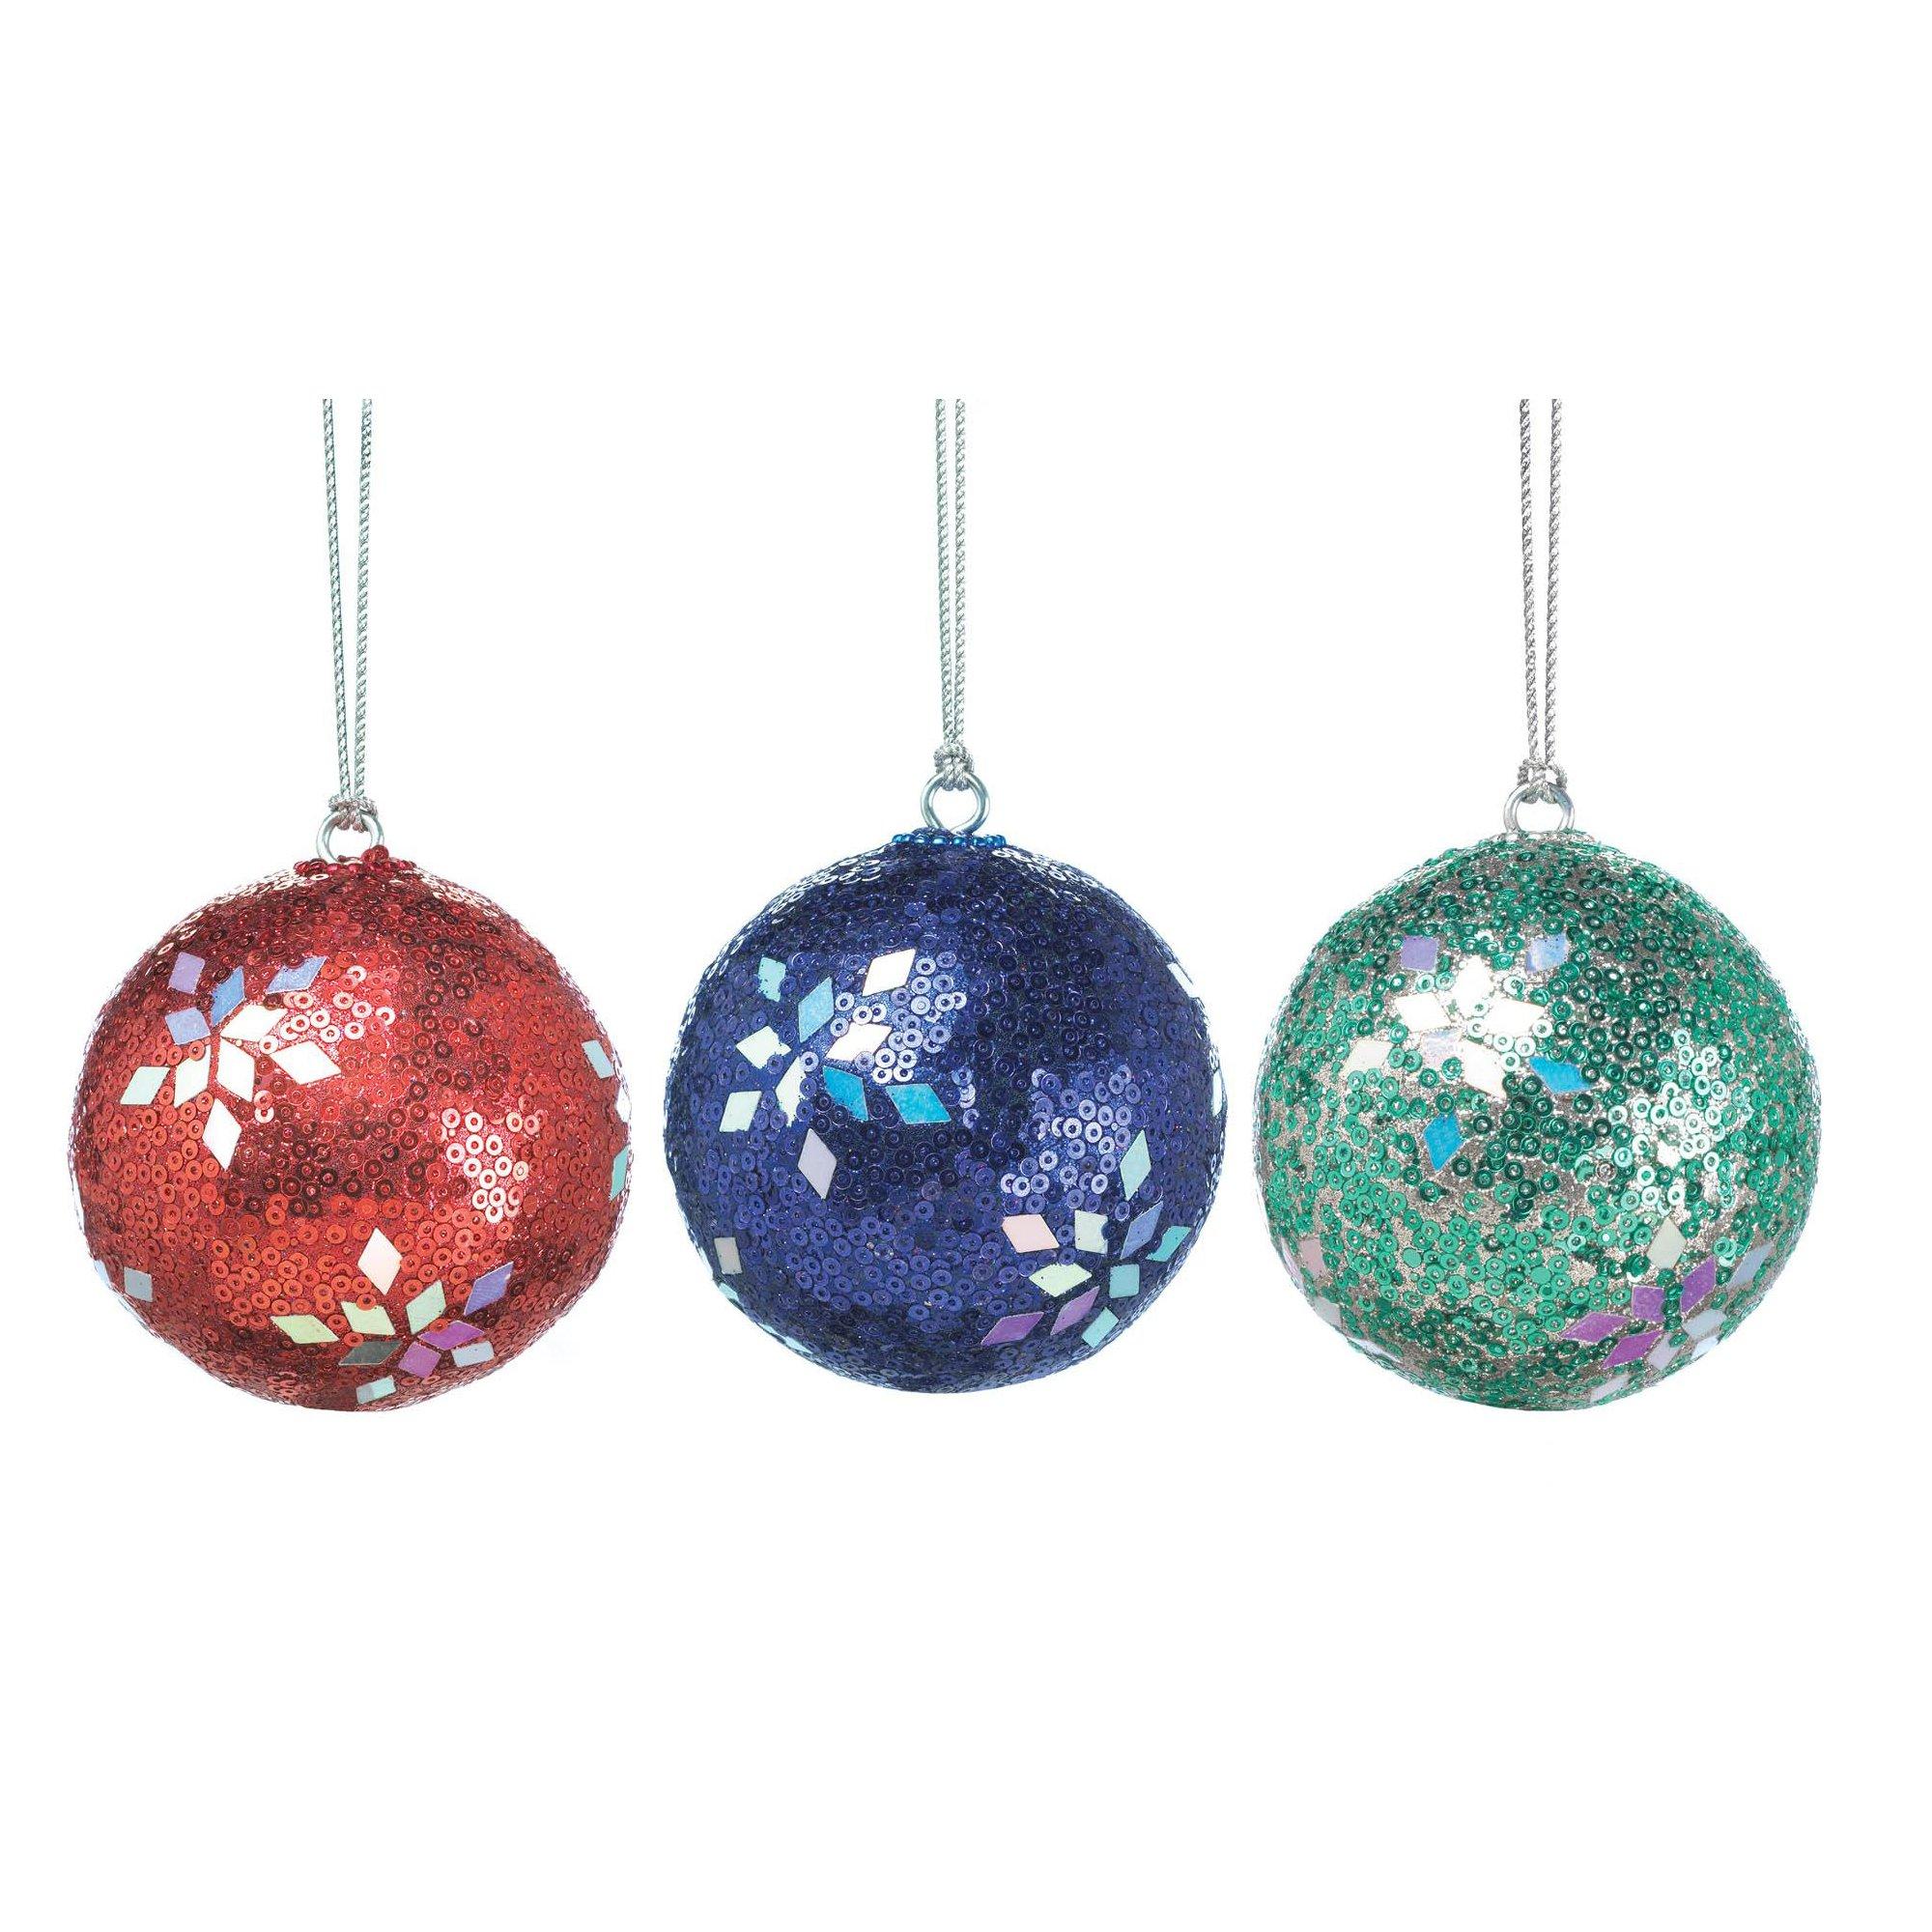 Plastic Ornament Balls, Red Blue Green Ornaments Balls For Home | eBay